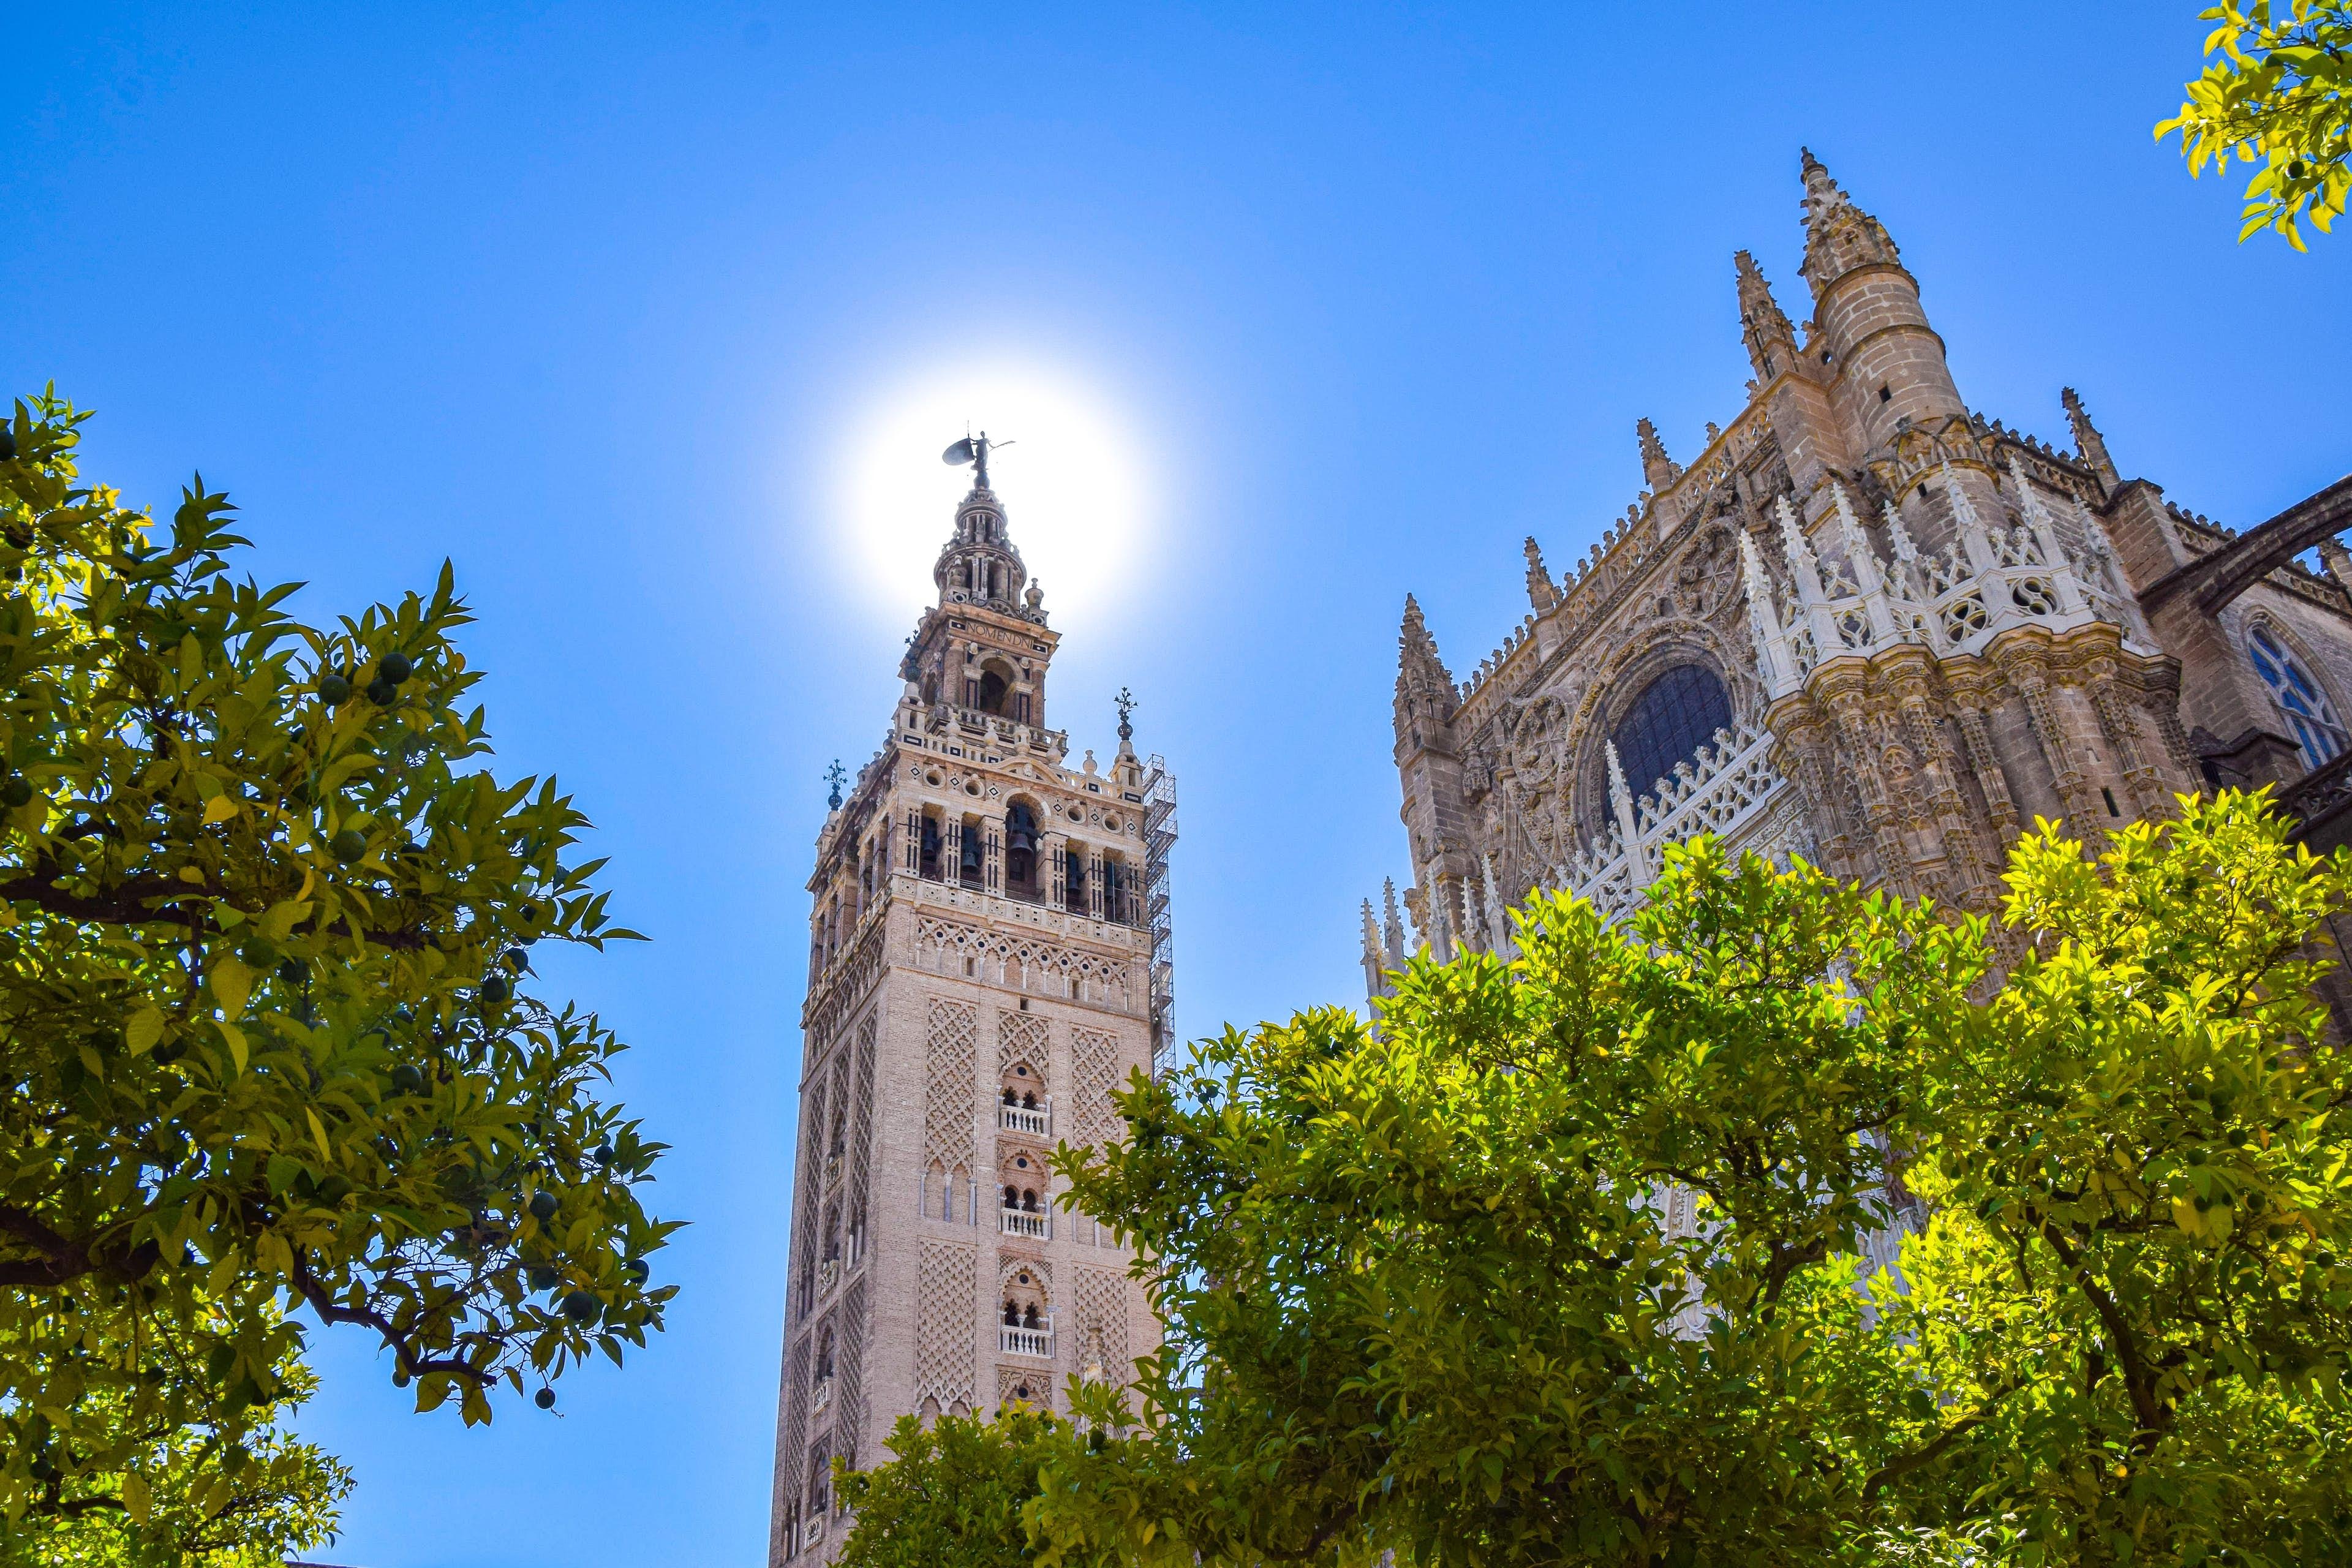 Seville Old Town: The Inheritance image